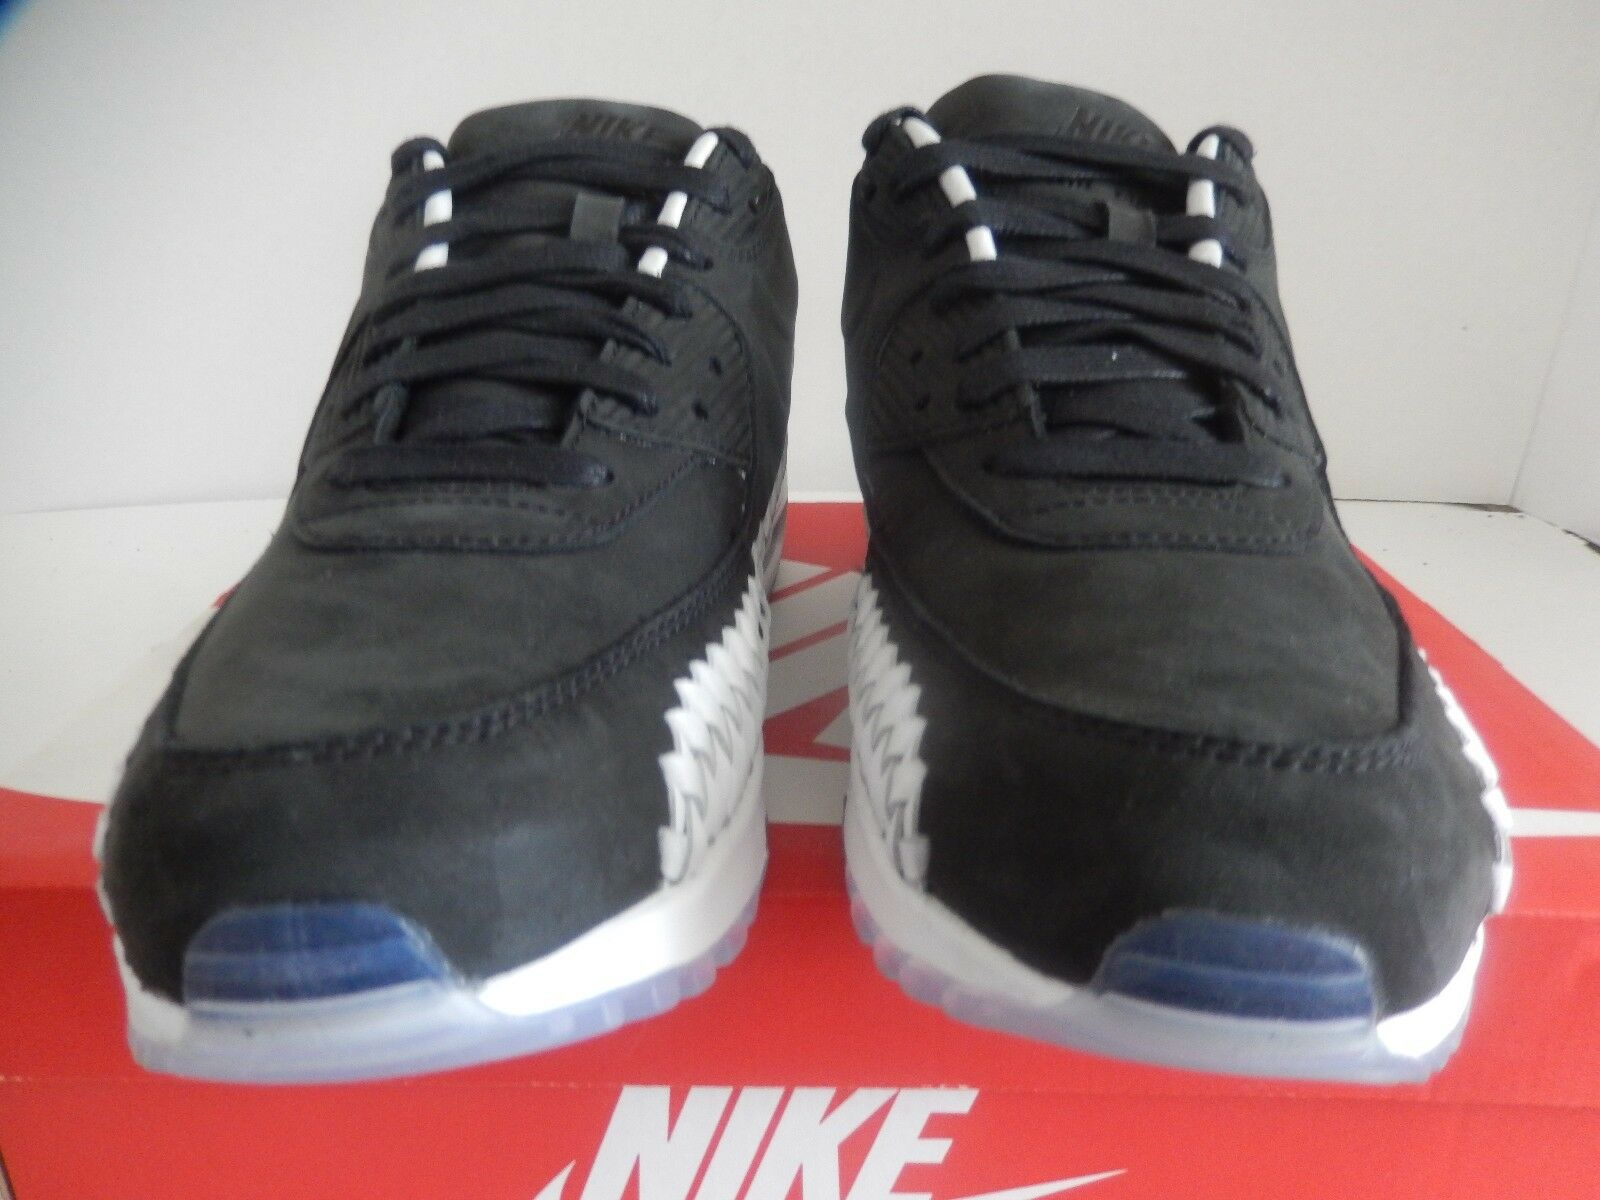 Nike air max tessuti 90 tessuti max nero-nero-white sz 9,5 384f65